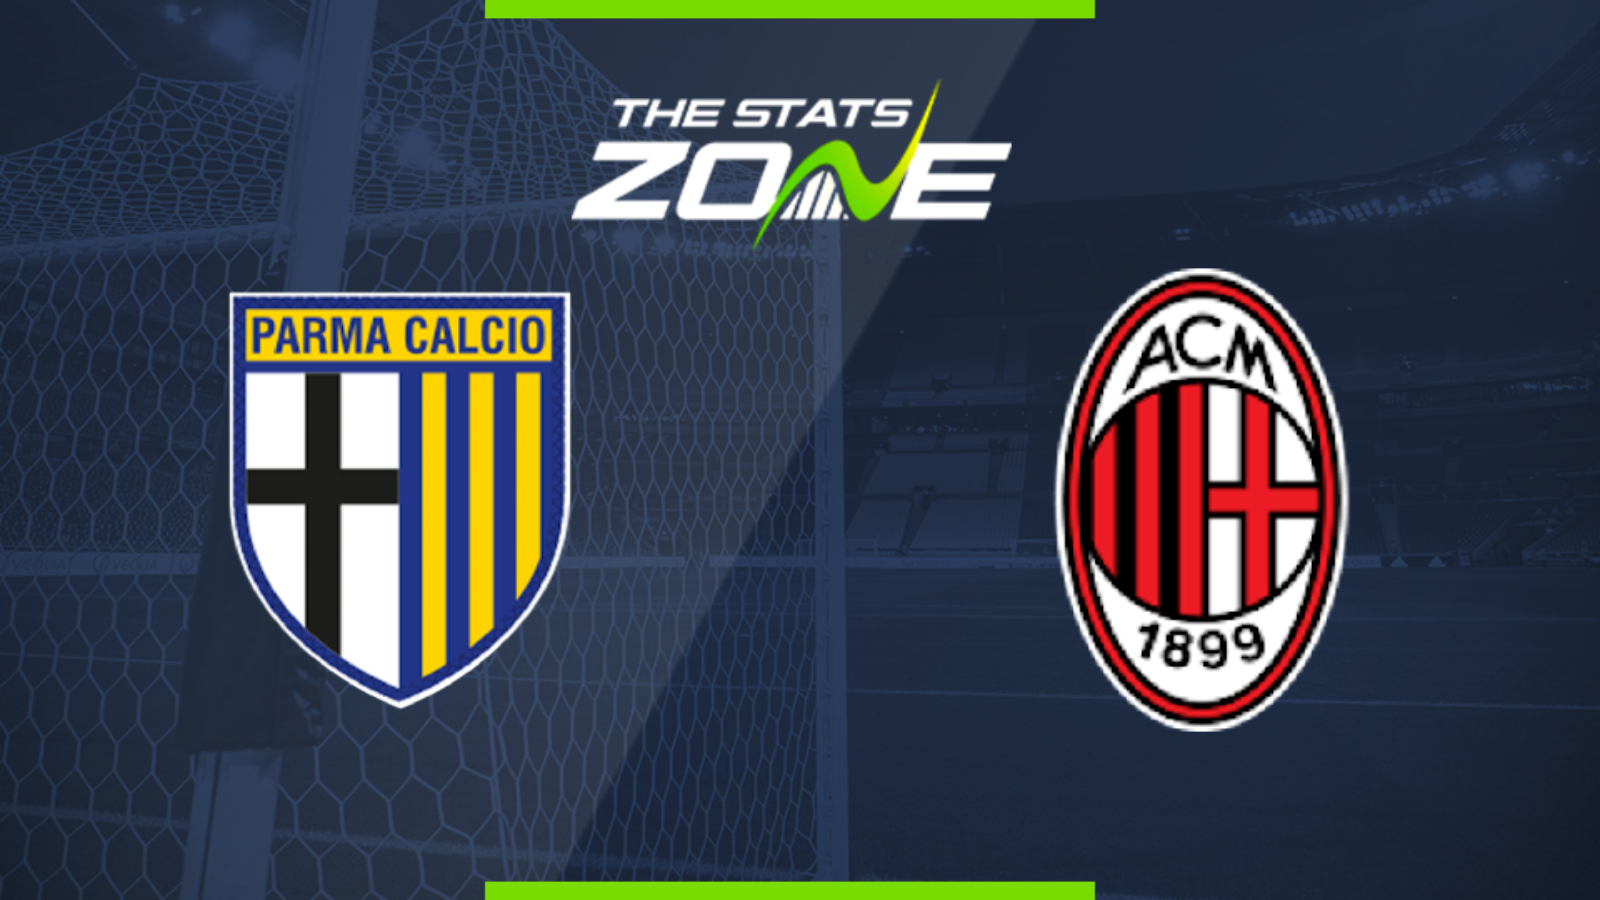 Parma vs AC Milan Full Match – Serie A 2020/21